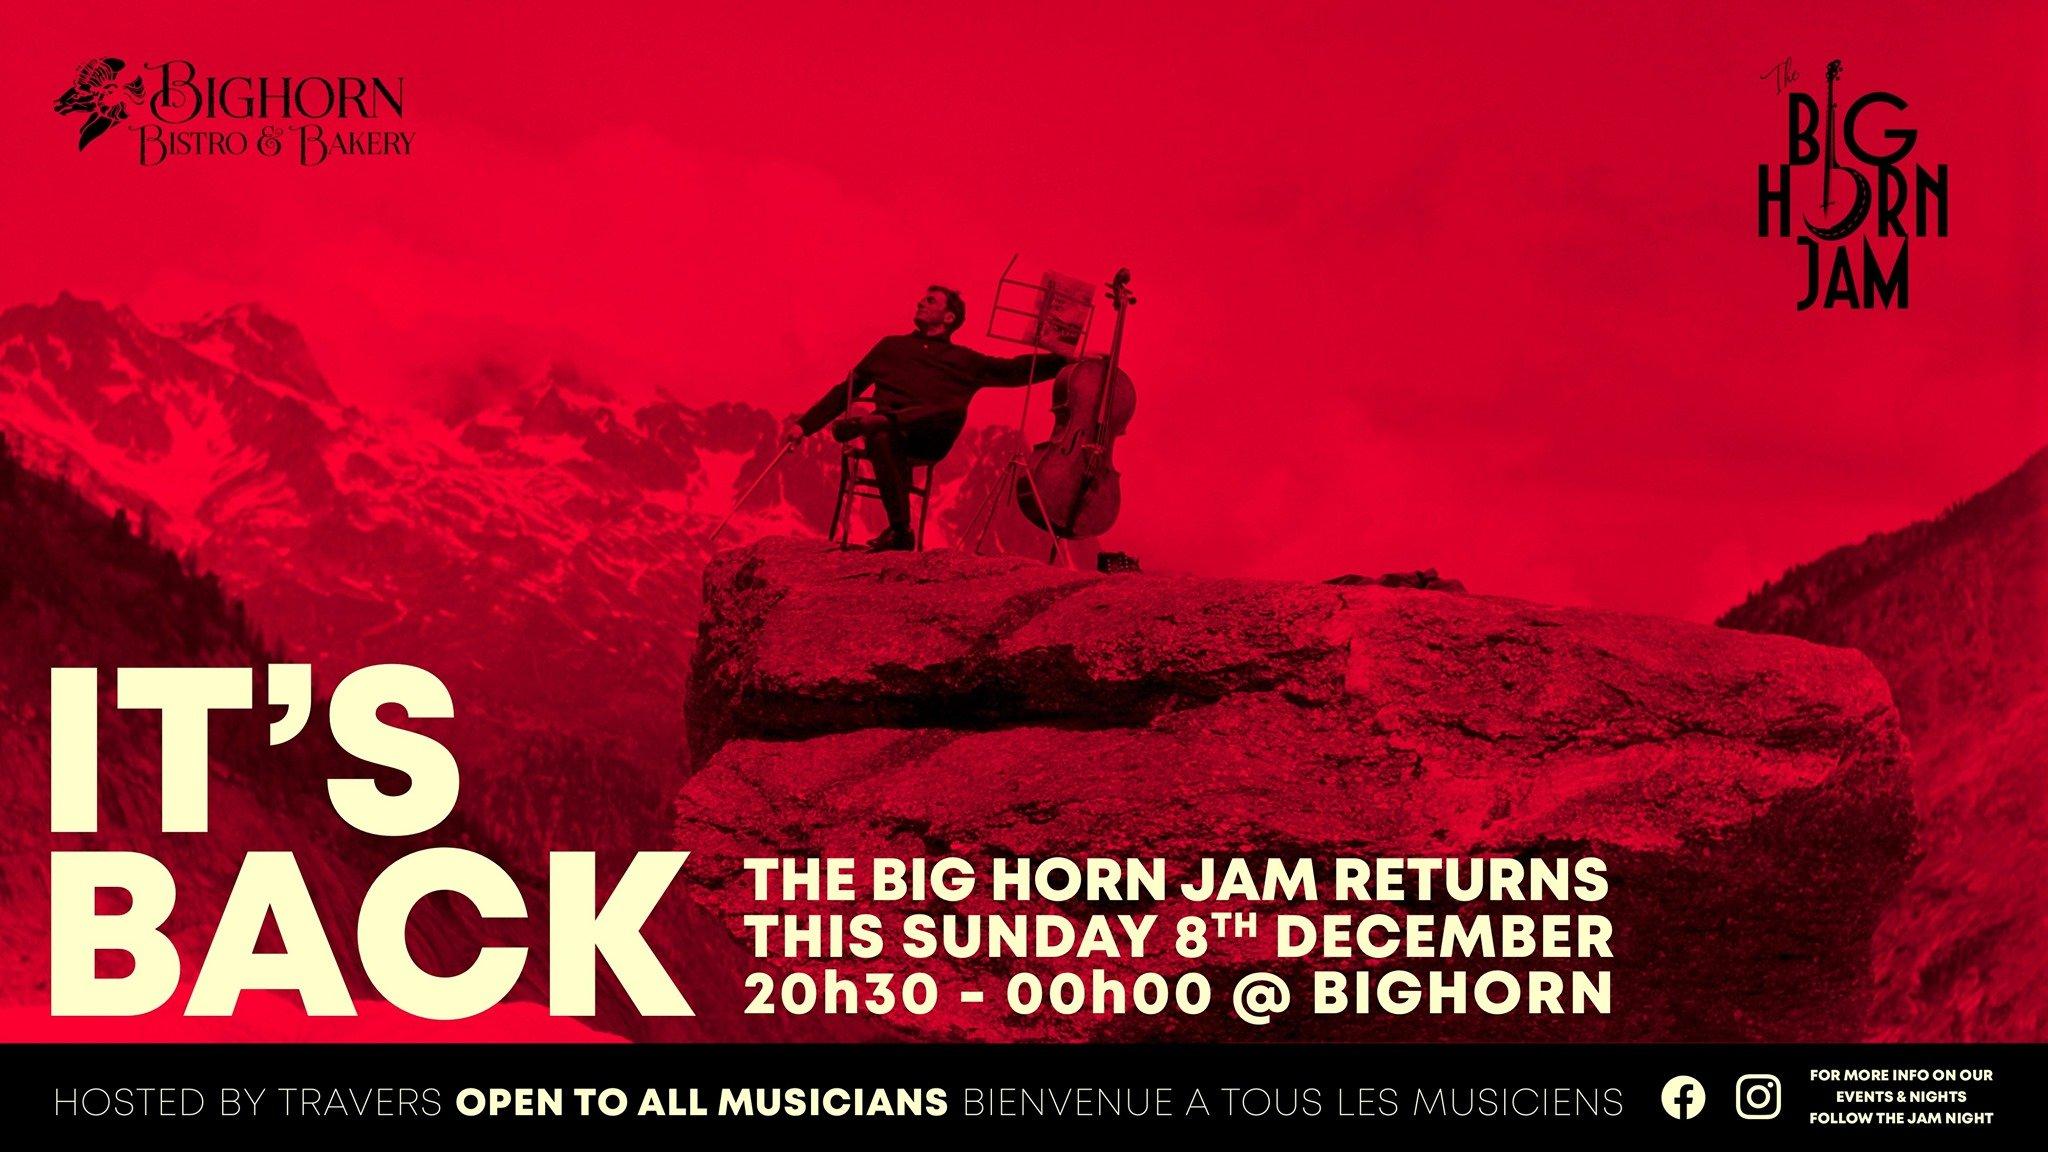 Tasty Jams - Sunday Jam Sessions at Bighorn, Chamonix